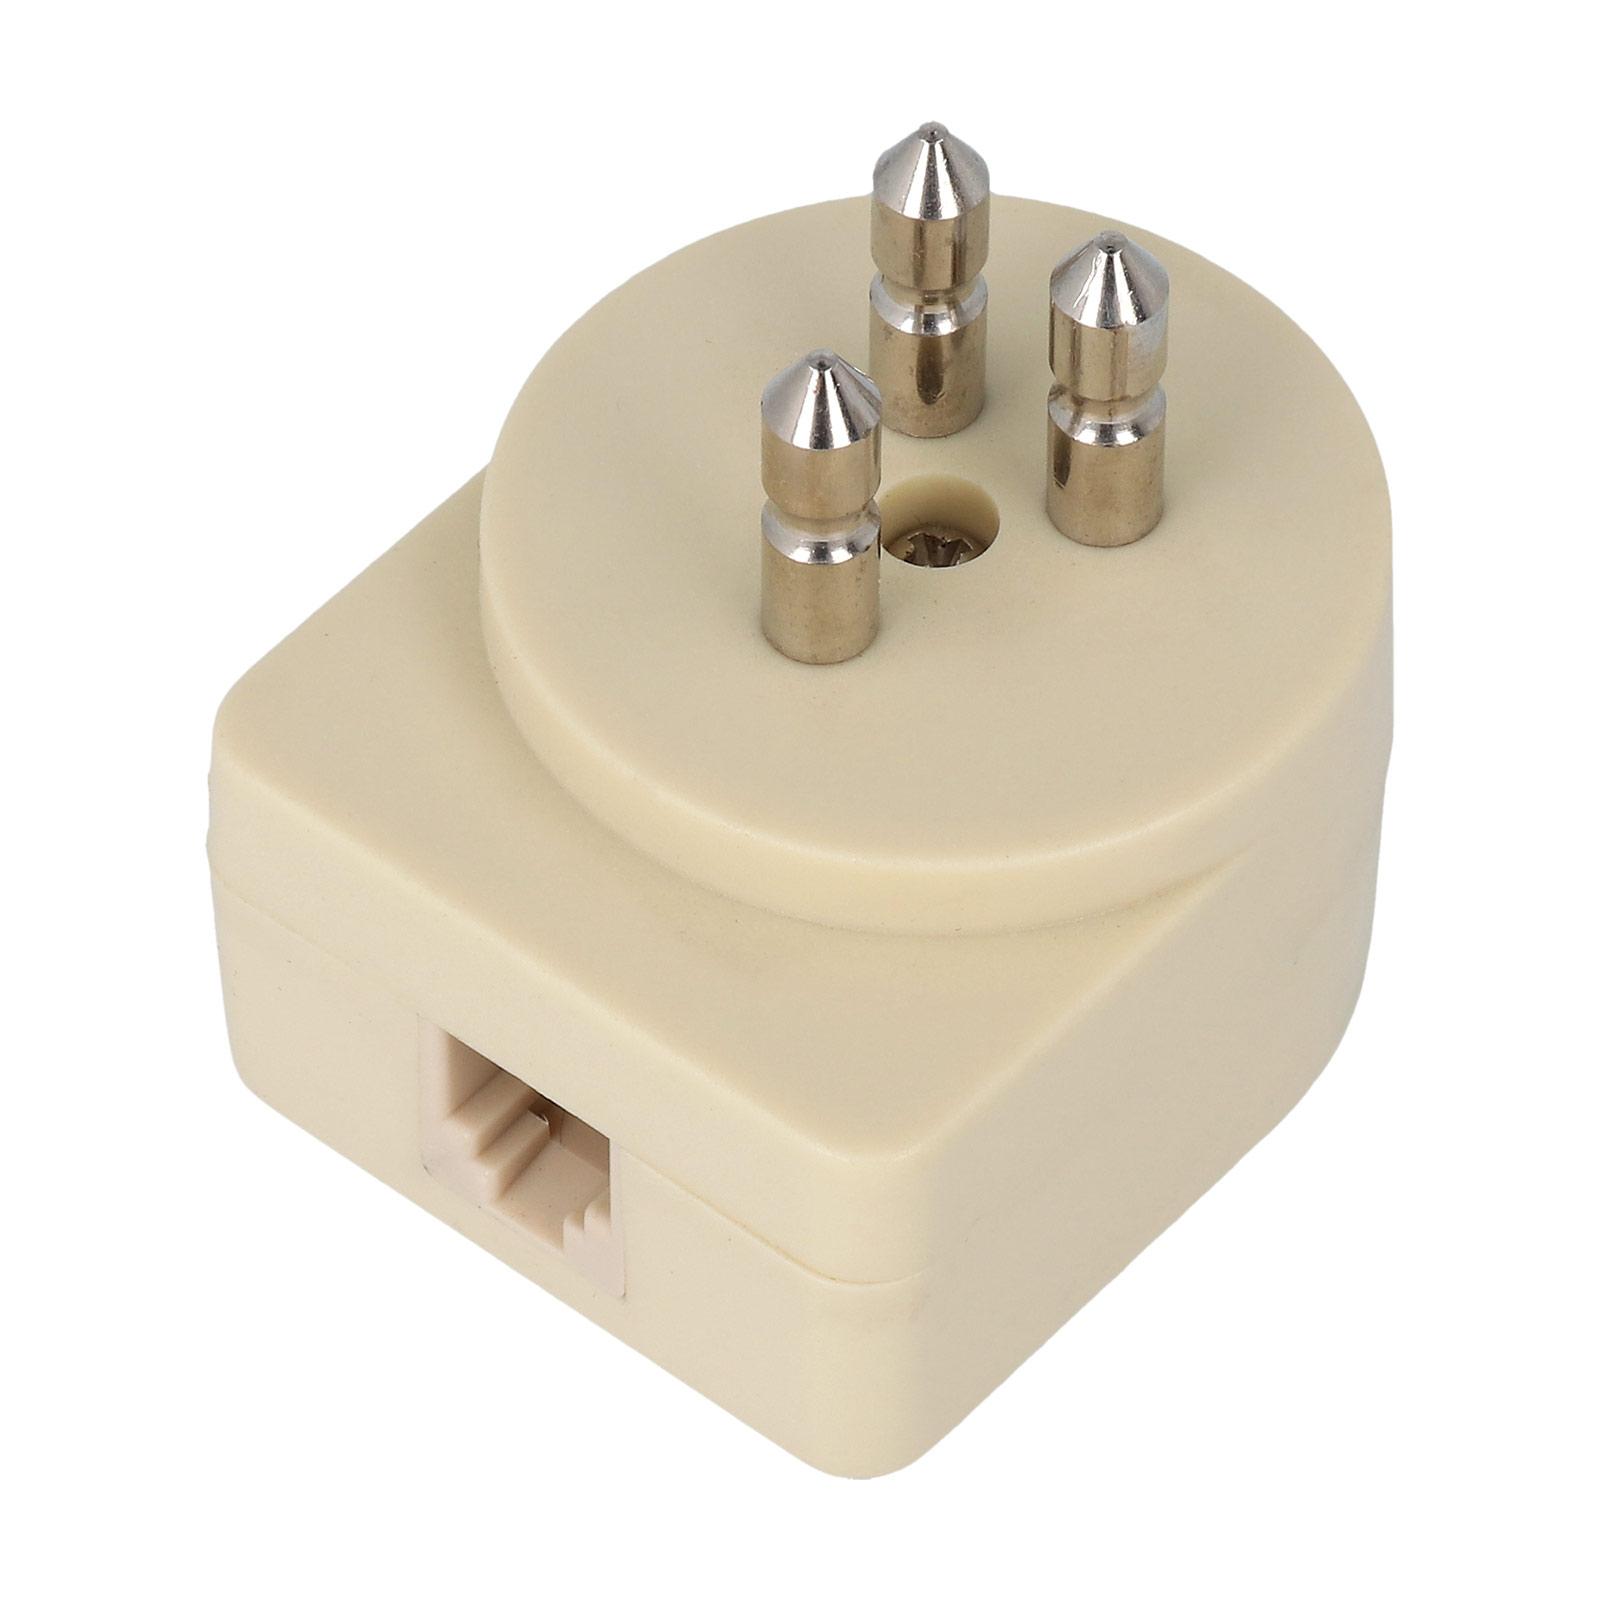 telefon modem adapter f r italien purenature. Black Bedroom Furniture Sets. Home Design Ideas